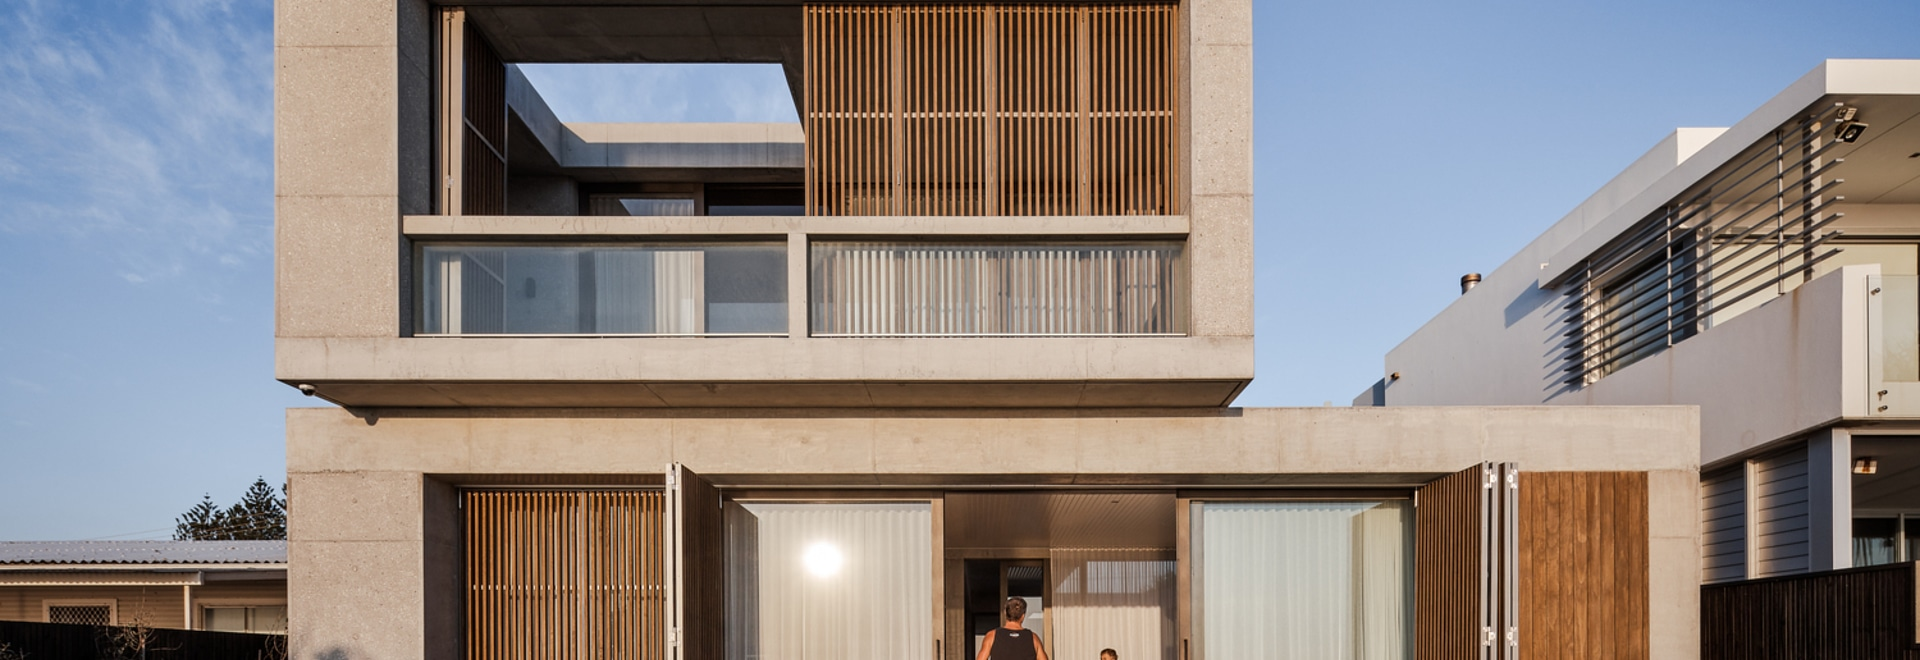 Mermaid Beach Residence / BE Architecture